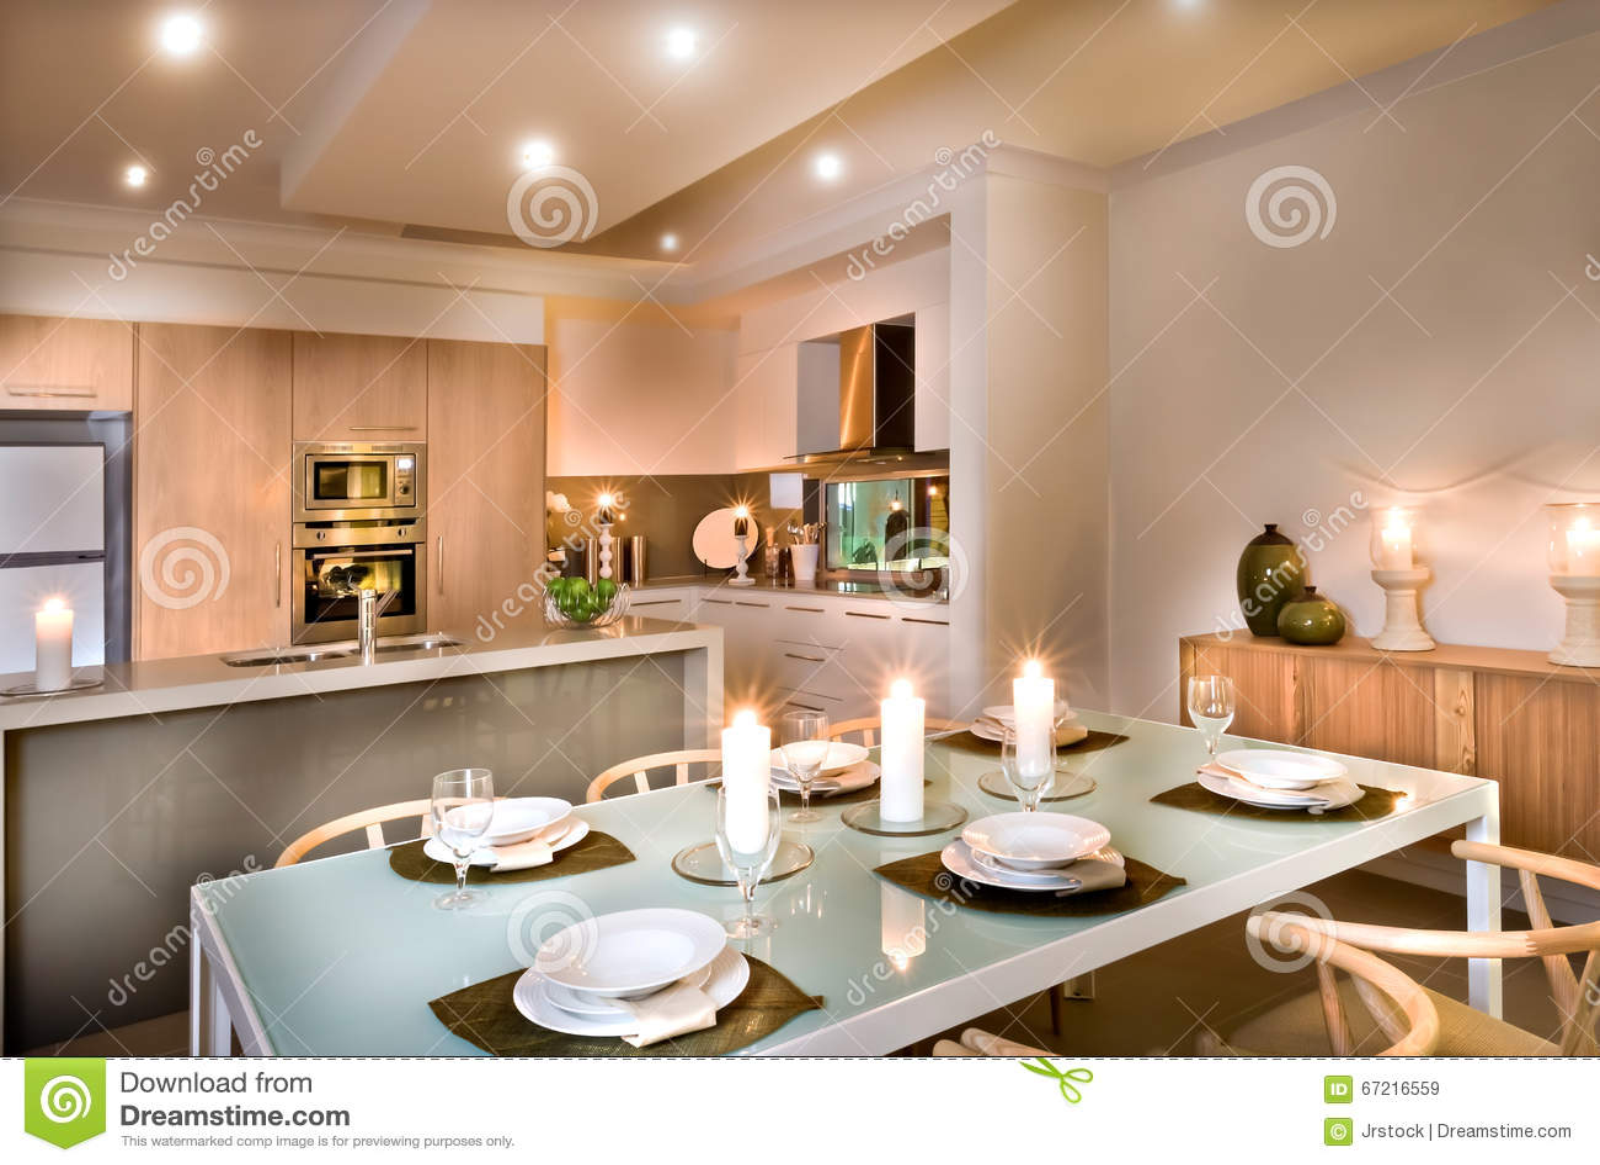 Nowożytna jadalnia i kuchnia